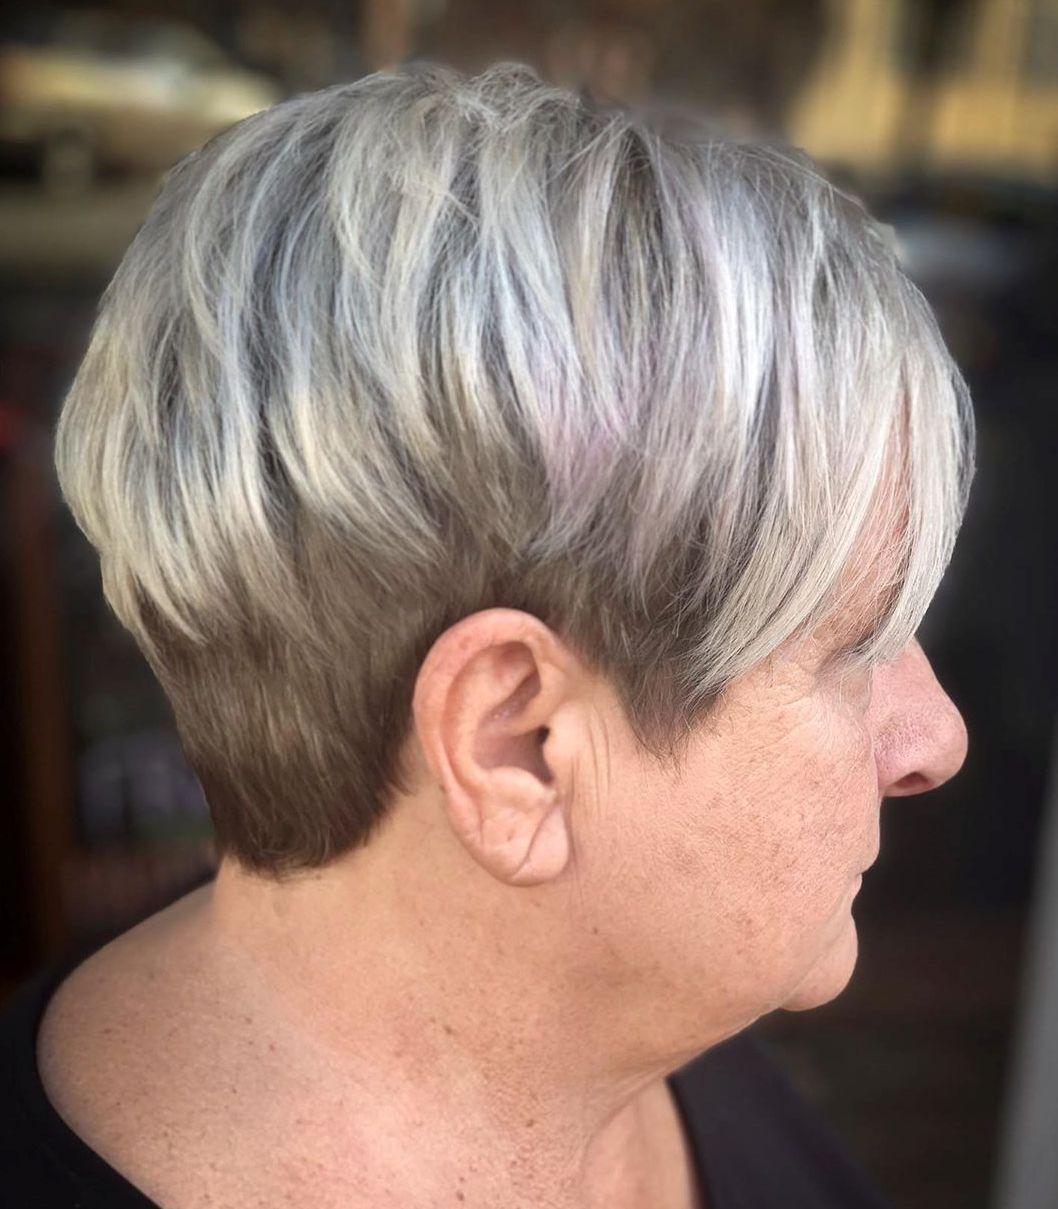 50 Wonderful Short Haircuts for Women Over 60 - Hair Adviser